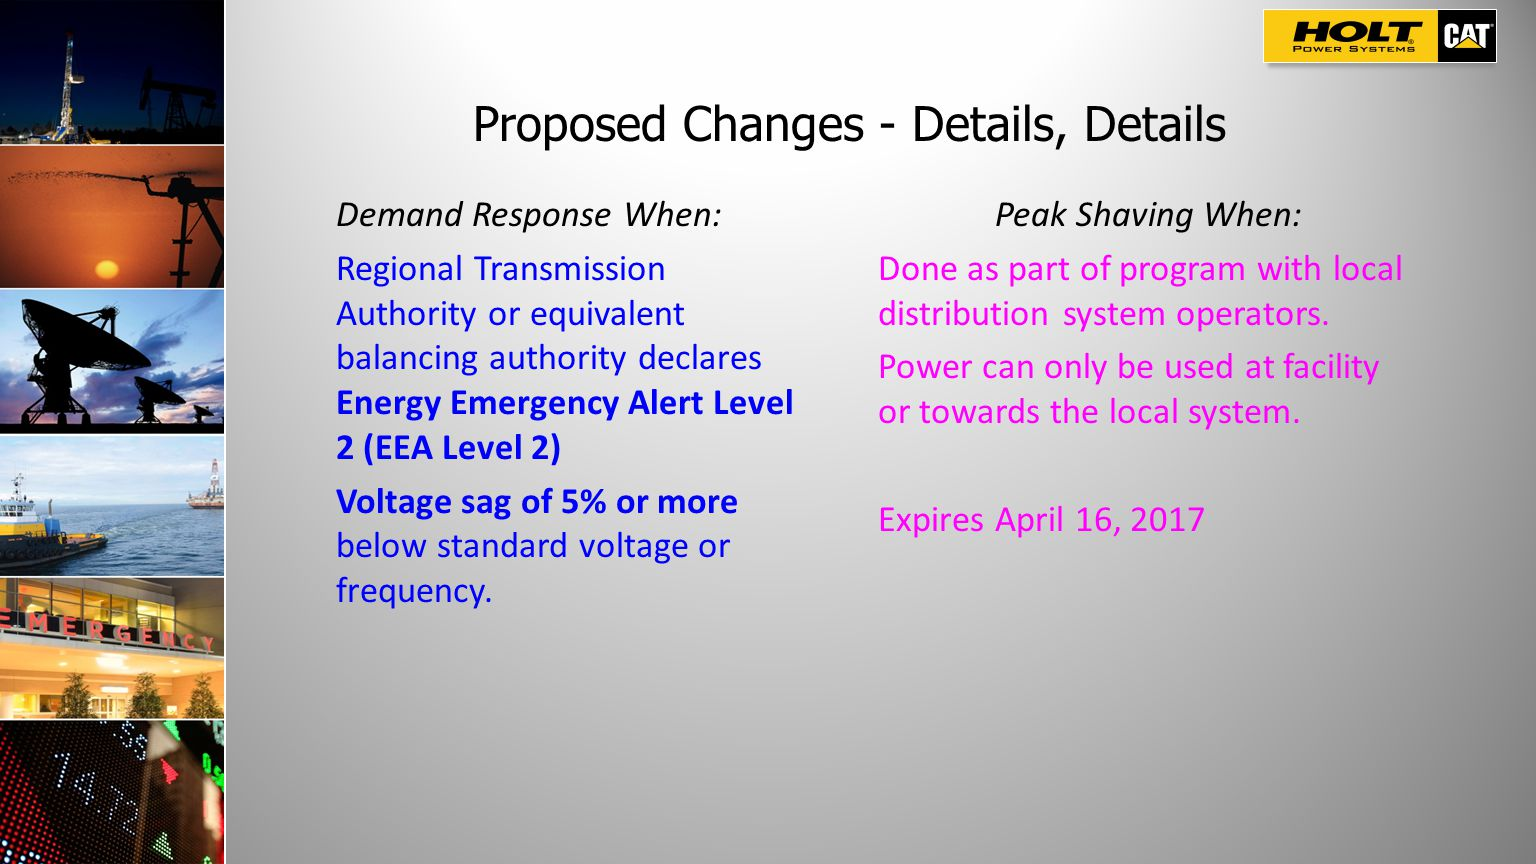 Proposed Changes - Details, Details